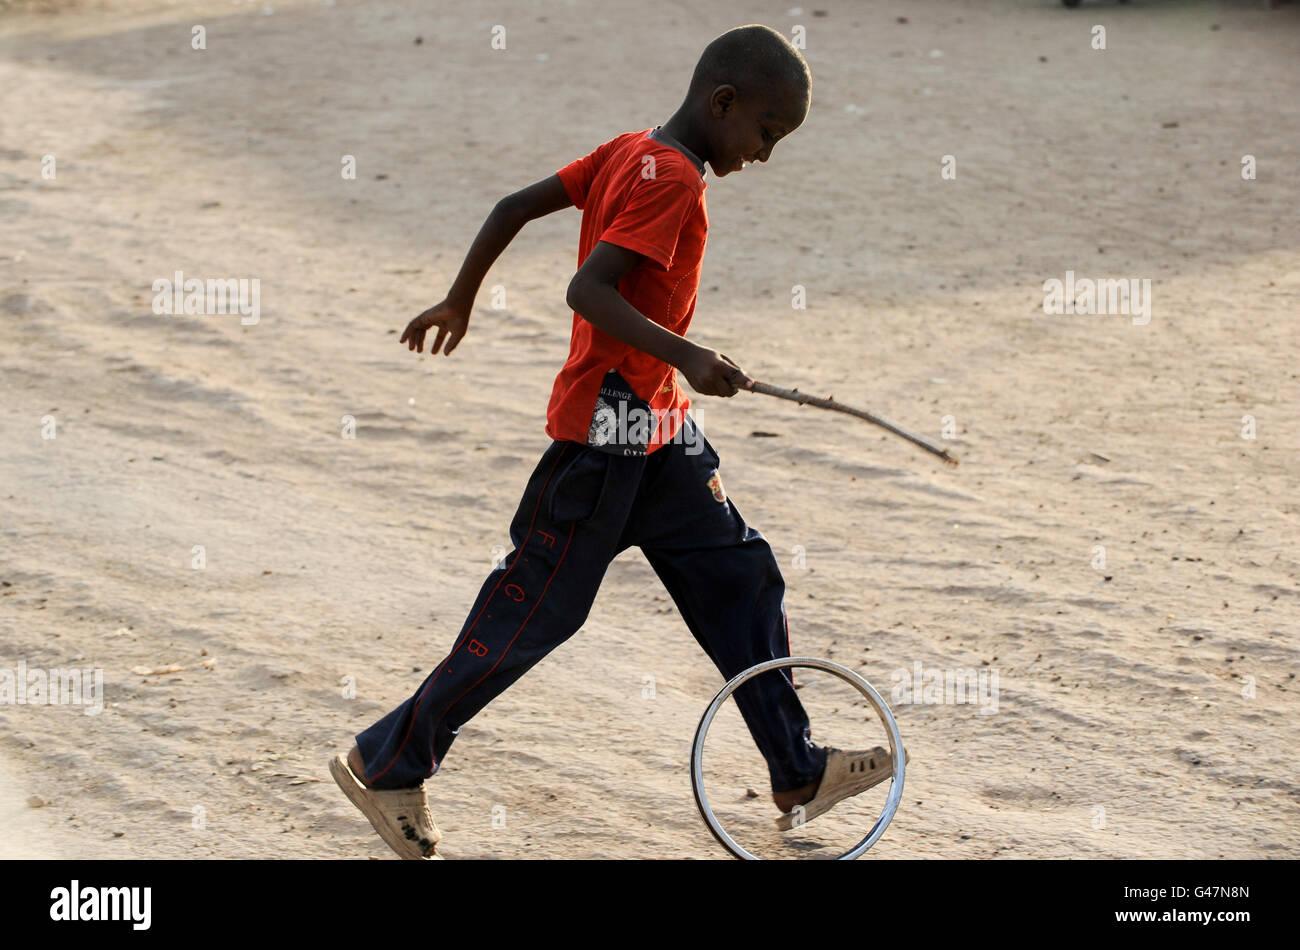 Kenya turkana region unhcr refugee camp kakuma where permanent 80 000 refugees from somalia